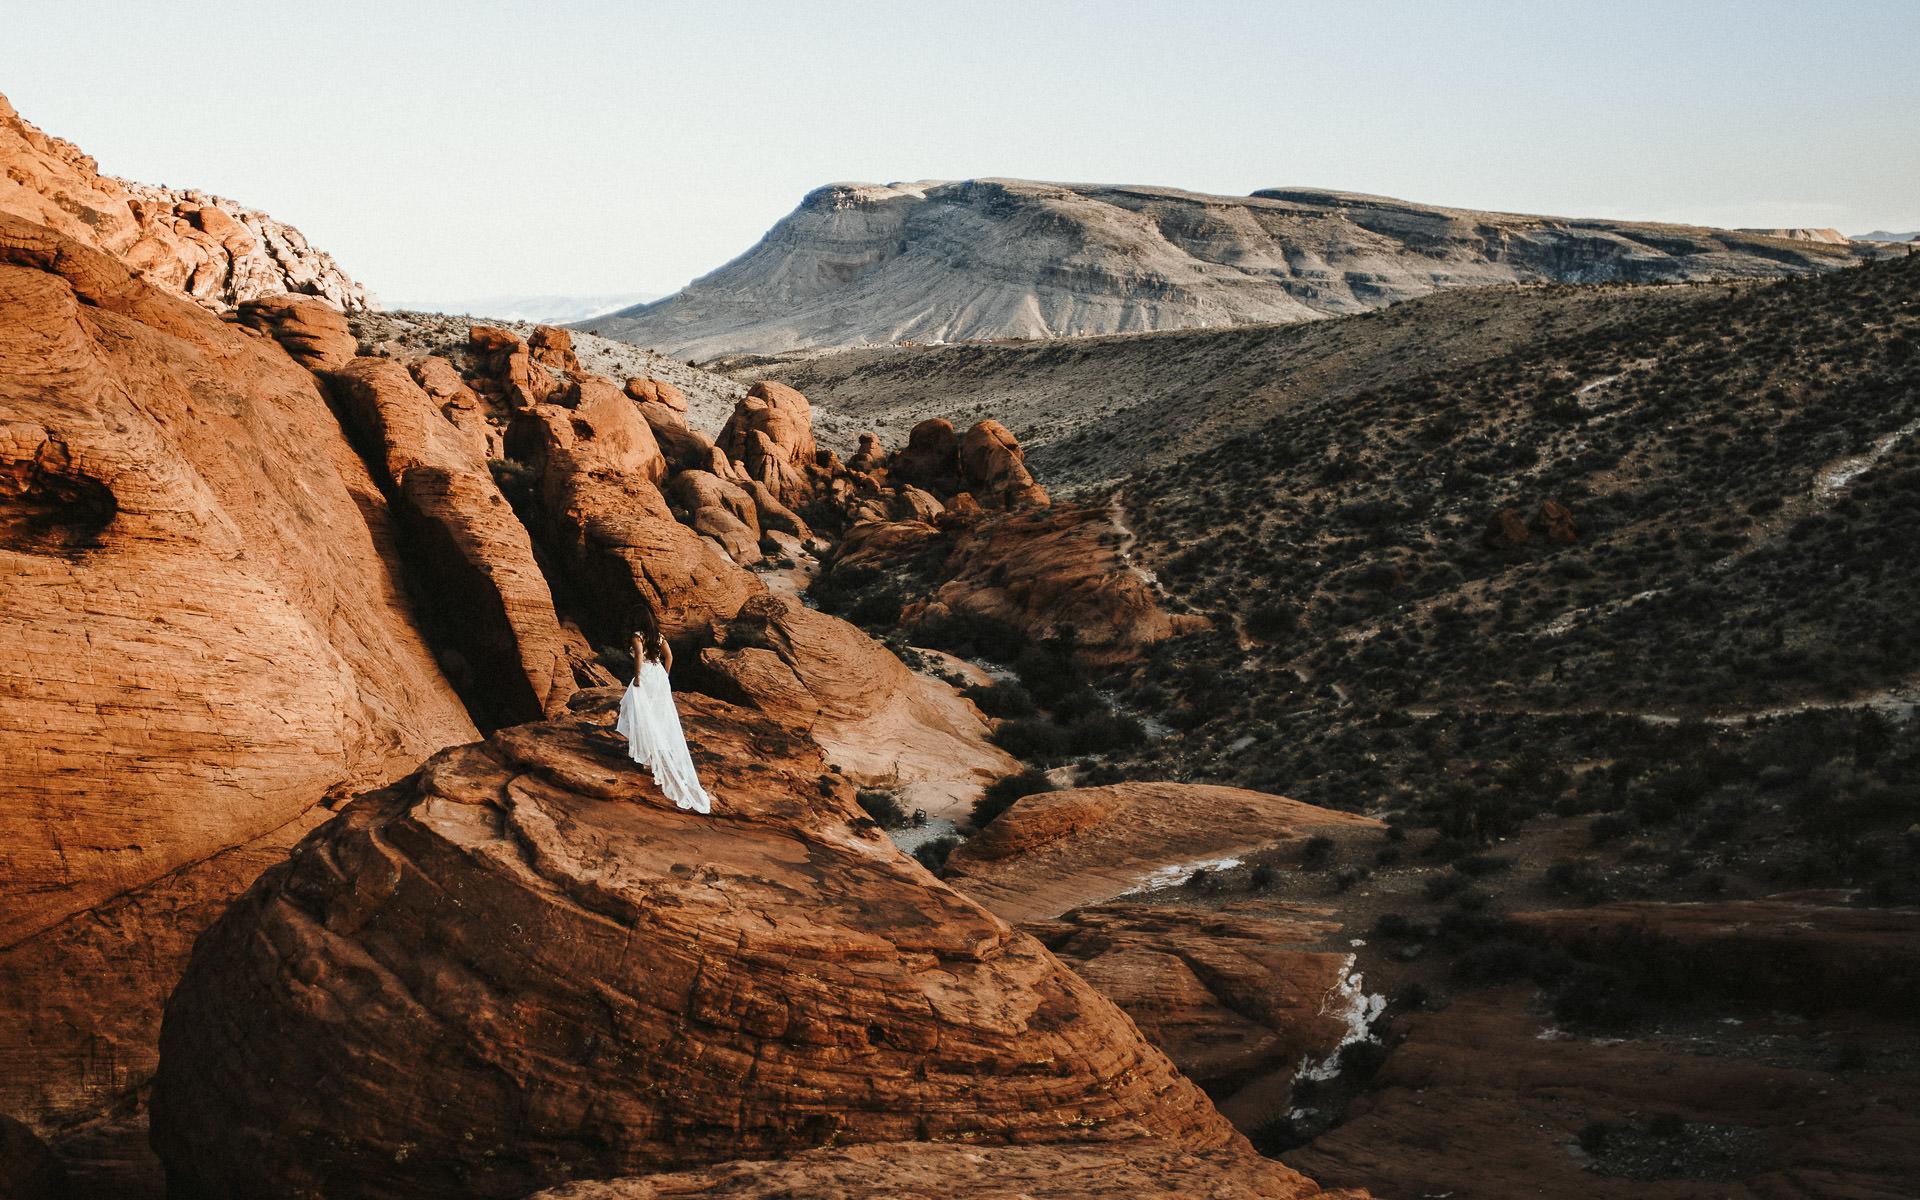 Twisted-oaks-studio-wppi-leica-red-rock-canyon-0017.jpg